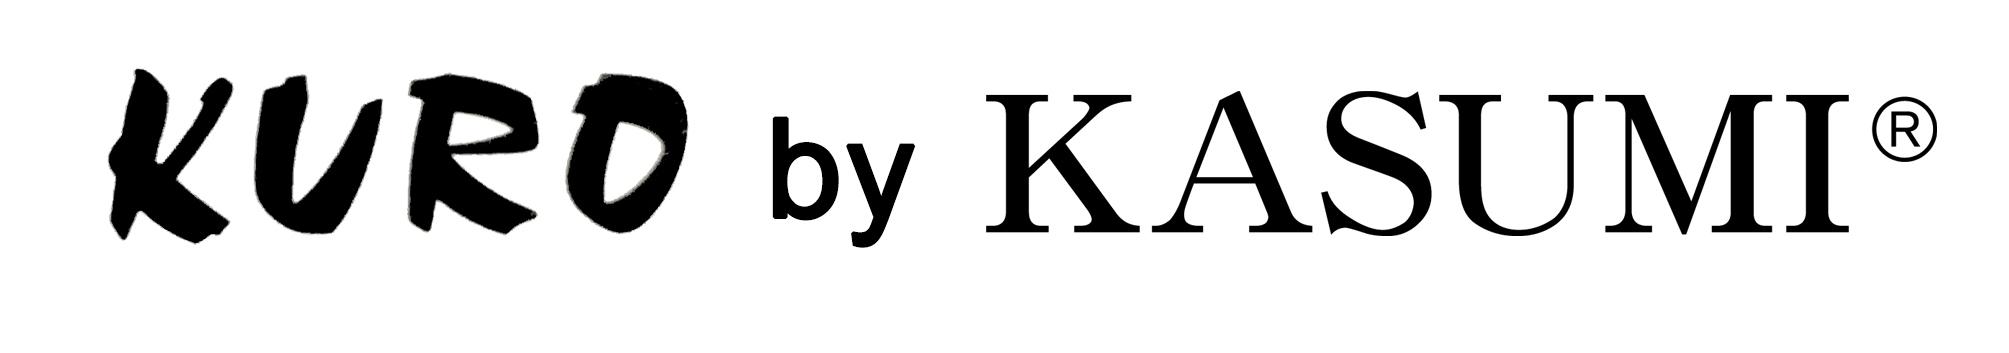 Kuro by Kasumi